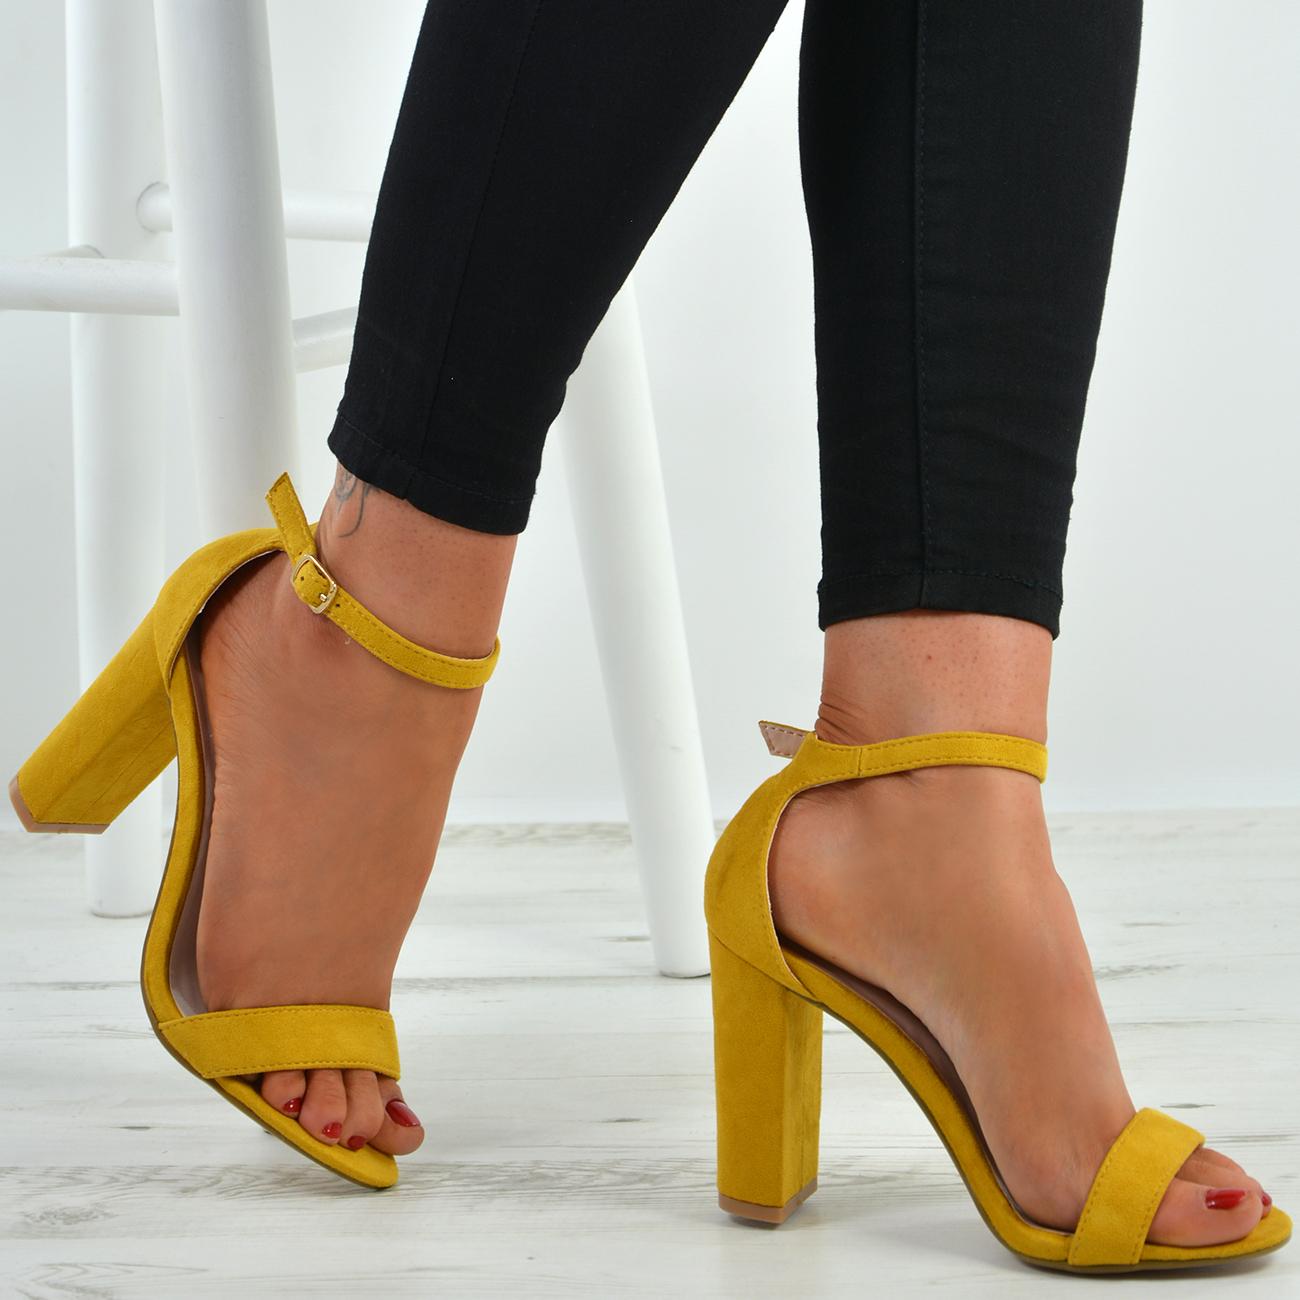 c2784e5bbaf New Womens Ankle Strap Block Heel Sandals Peep Toe Ladies Shoes Size ...